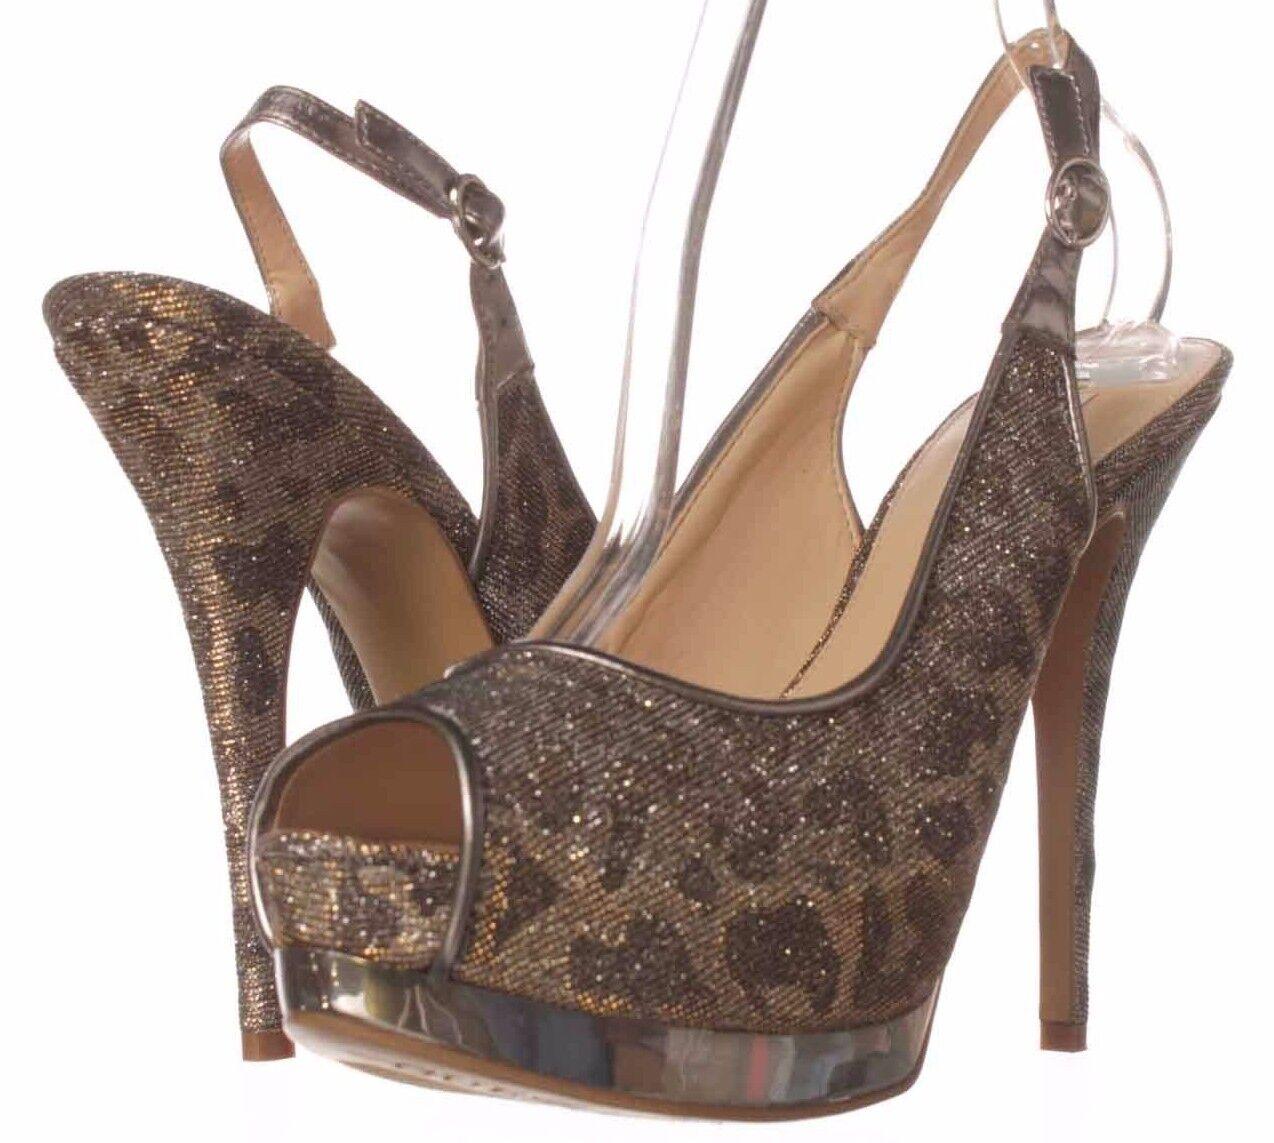 GUESS Glenisa Silver Glitter Fabric Leopard Platform Slingback Schuhes, 7.5M 9